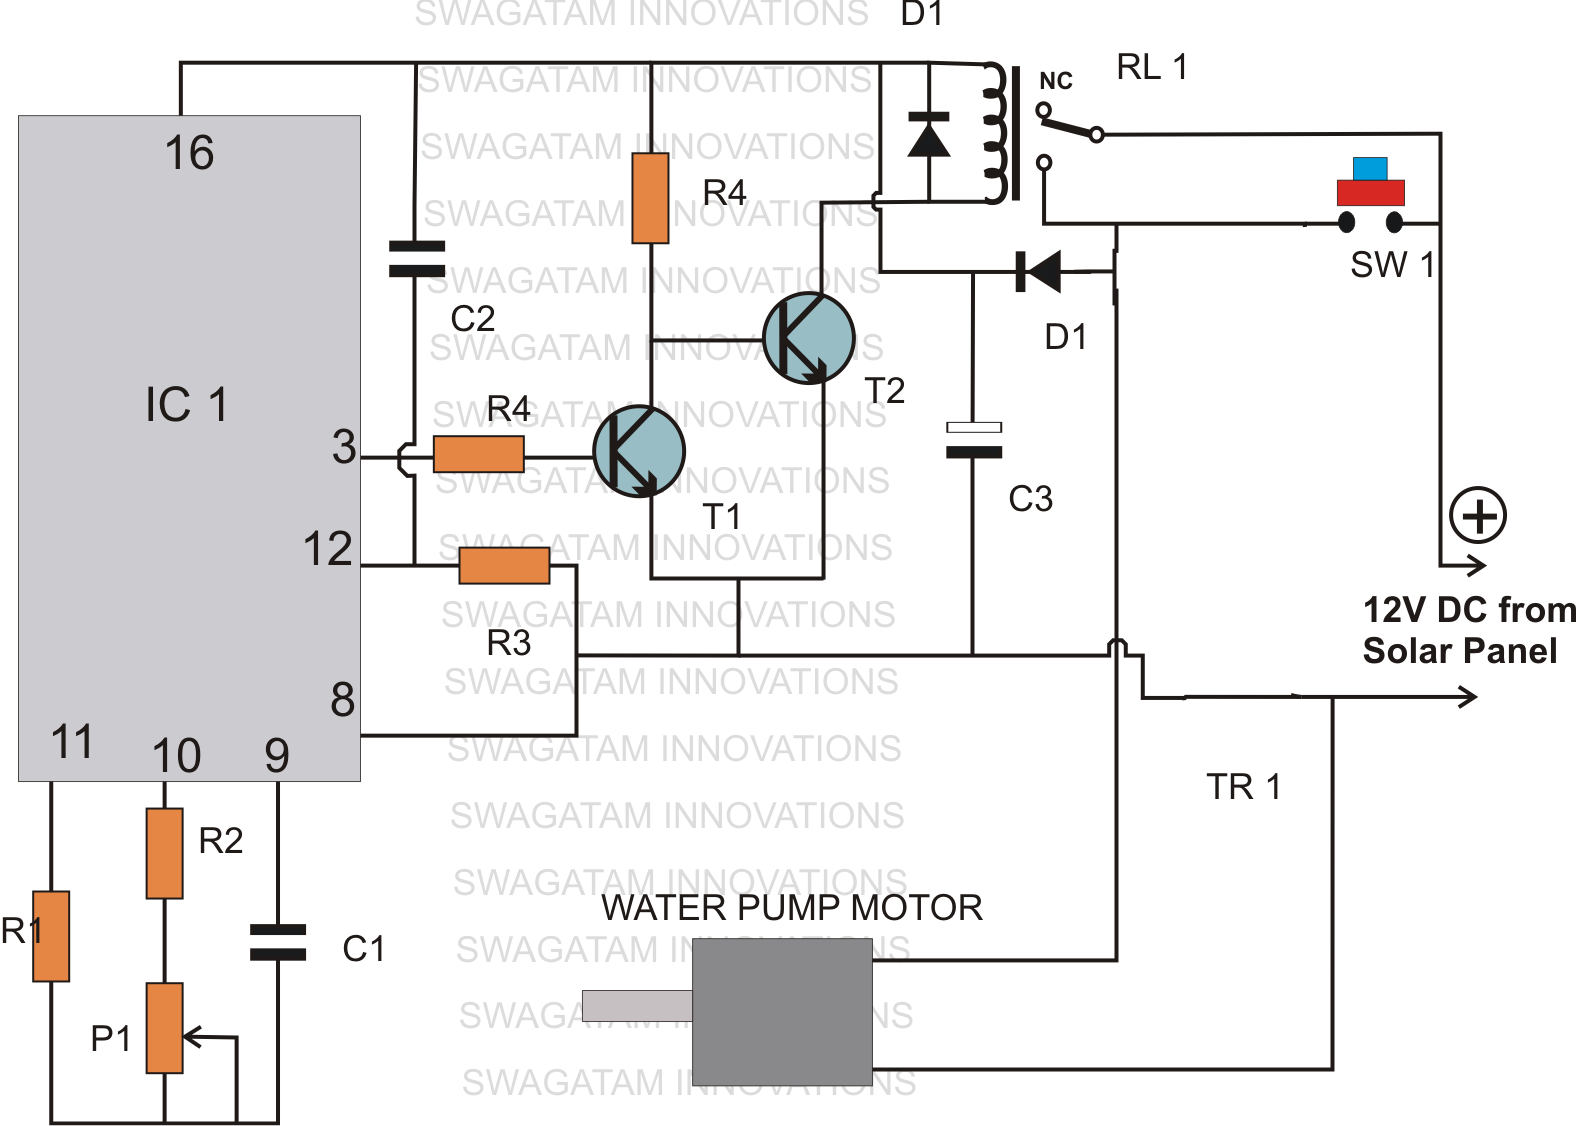 hight resolution of pacific hydrostar water pump wiring diagrams wiring library rh 47 yoobi de deep water well jet pumps pacific hydrostar 1 hp shallow well pump